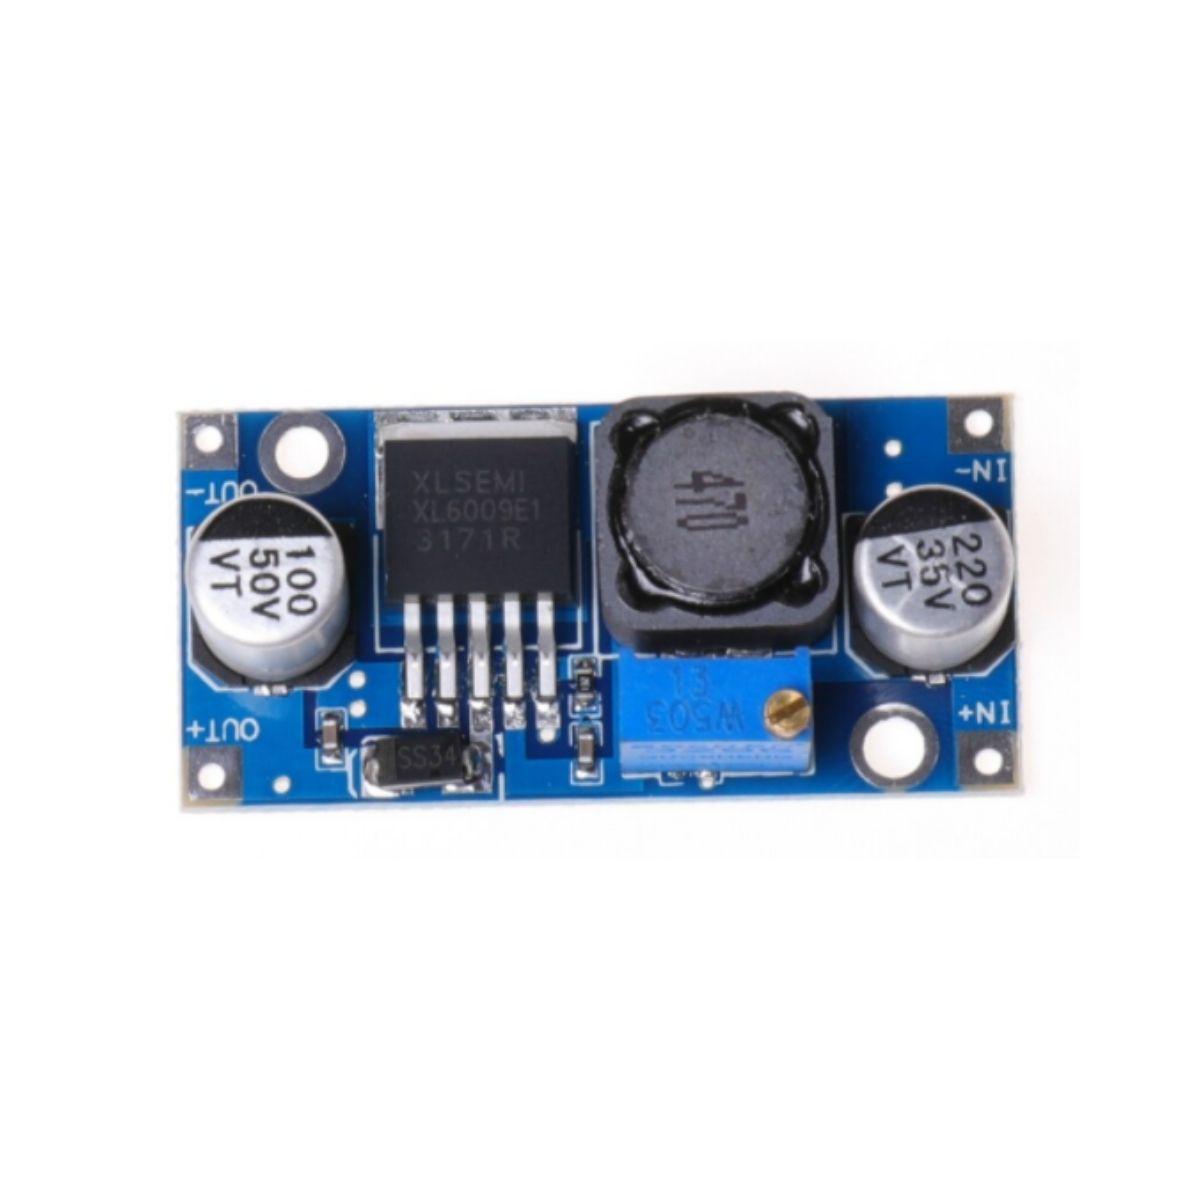 20x Conversor Regulador de Tensão DC DC Cn6009 Xl6009 Boost Step Up